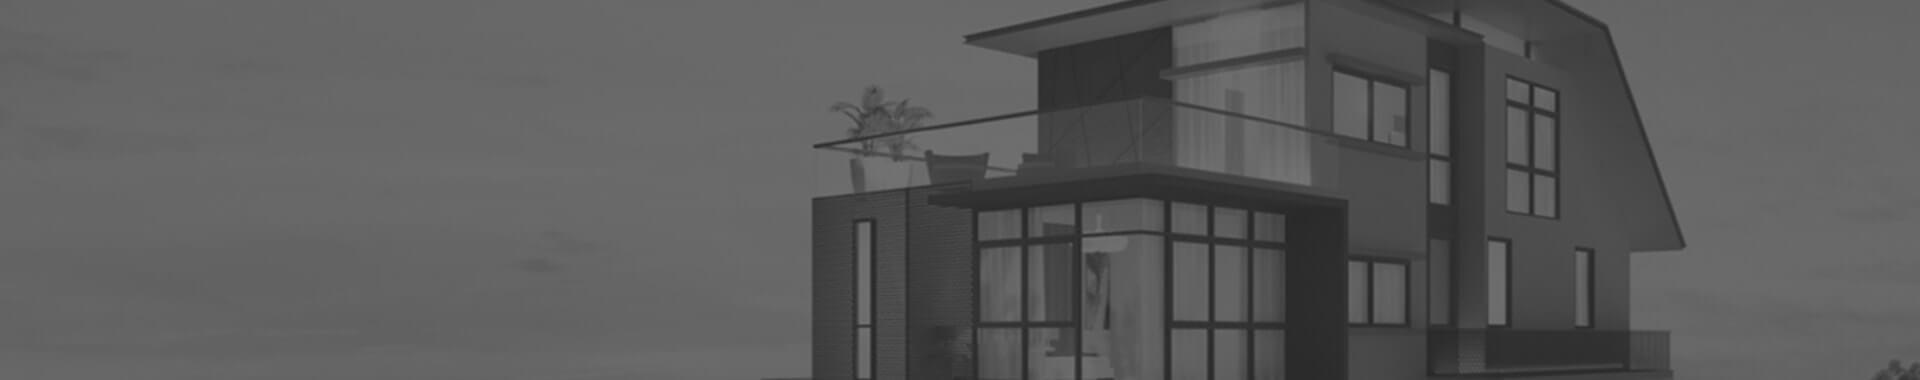 Website Design Singapore - BUILDERS HUB